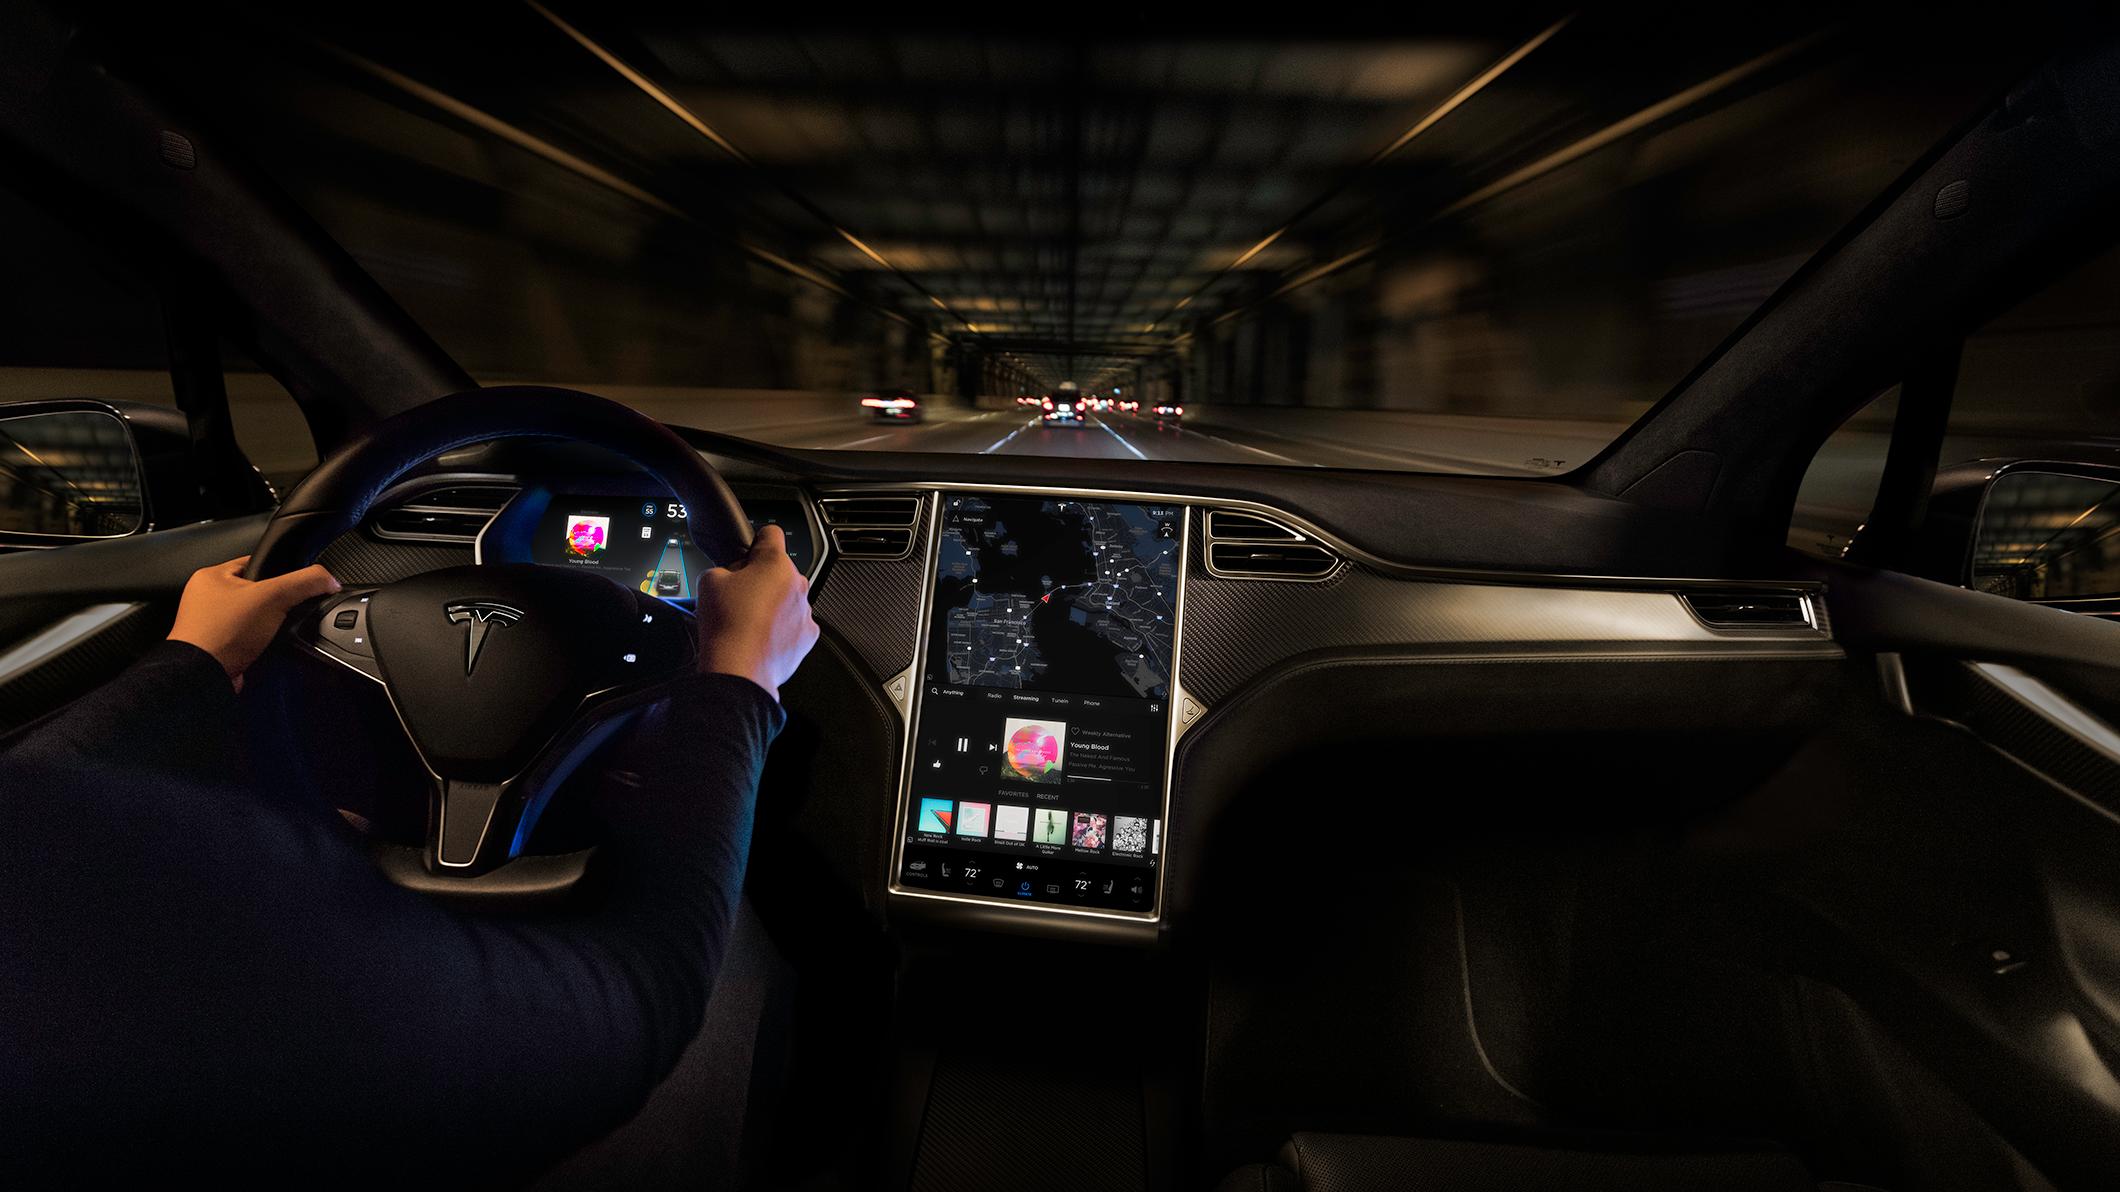 Tesla Model X interior with Autopilot activated.